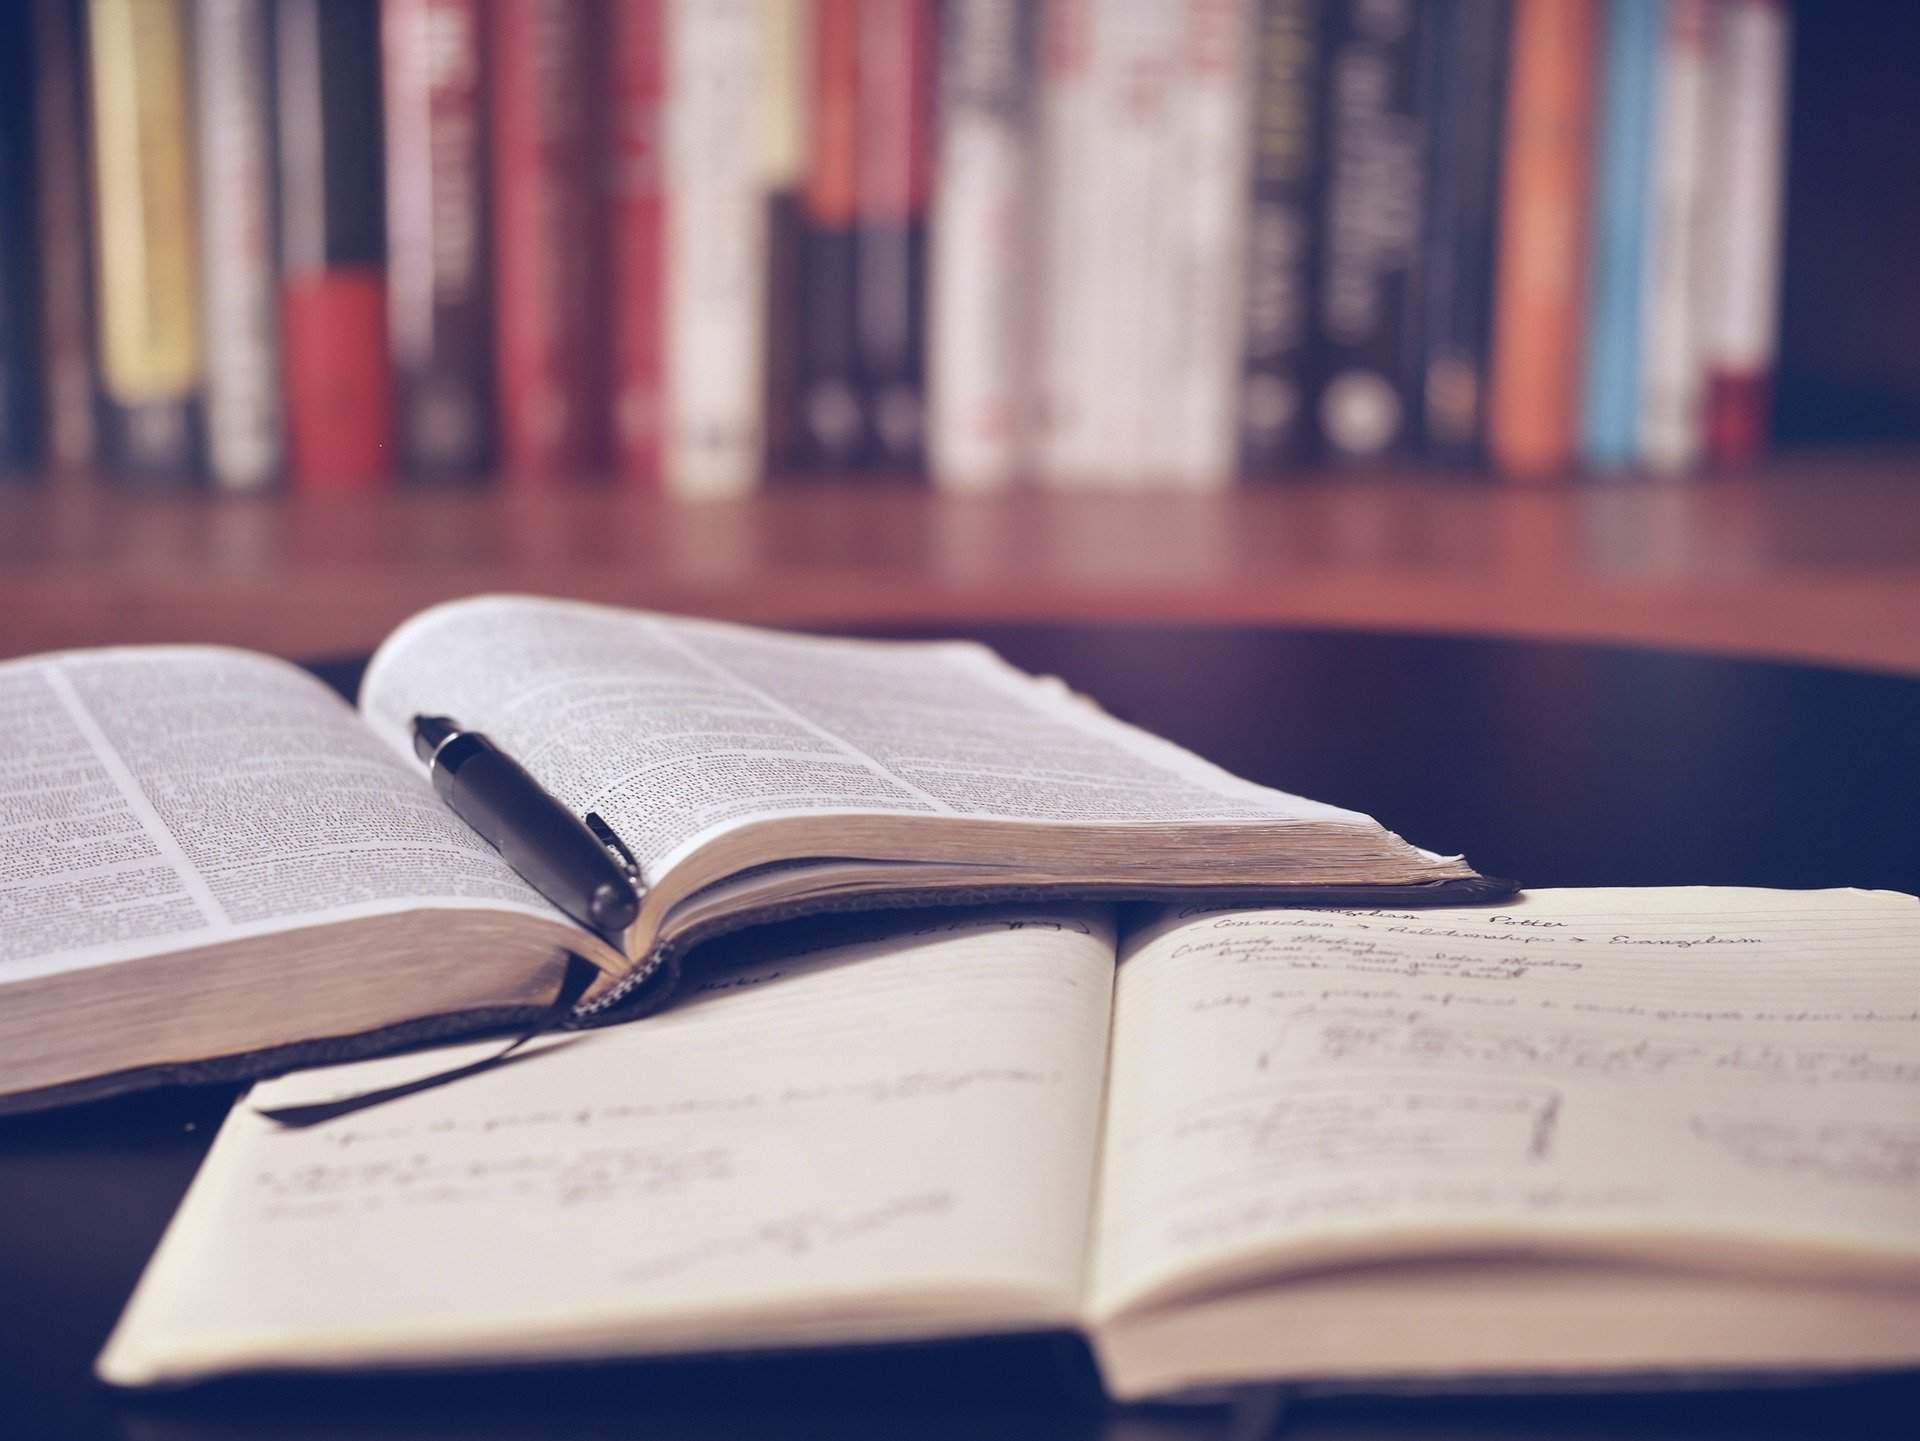 book learning school study language Hungarian